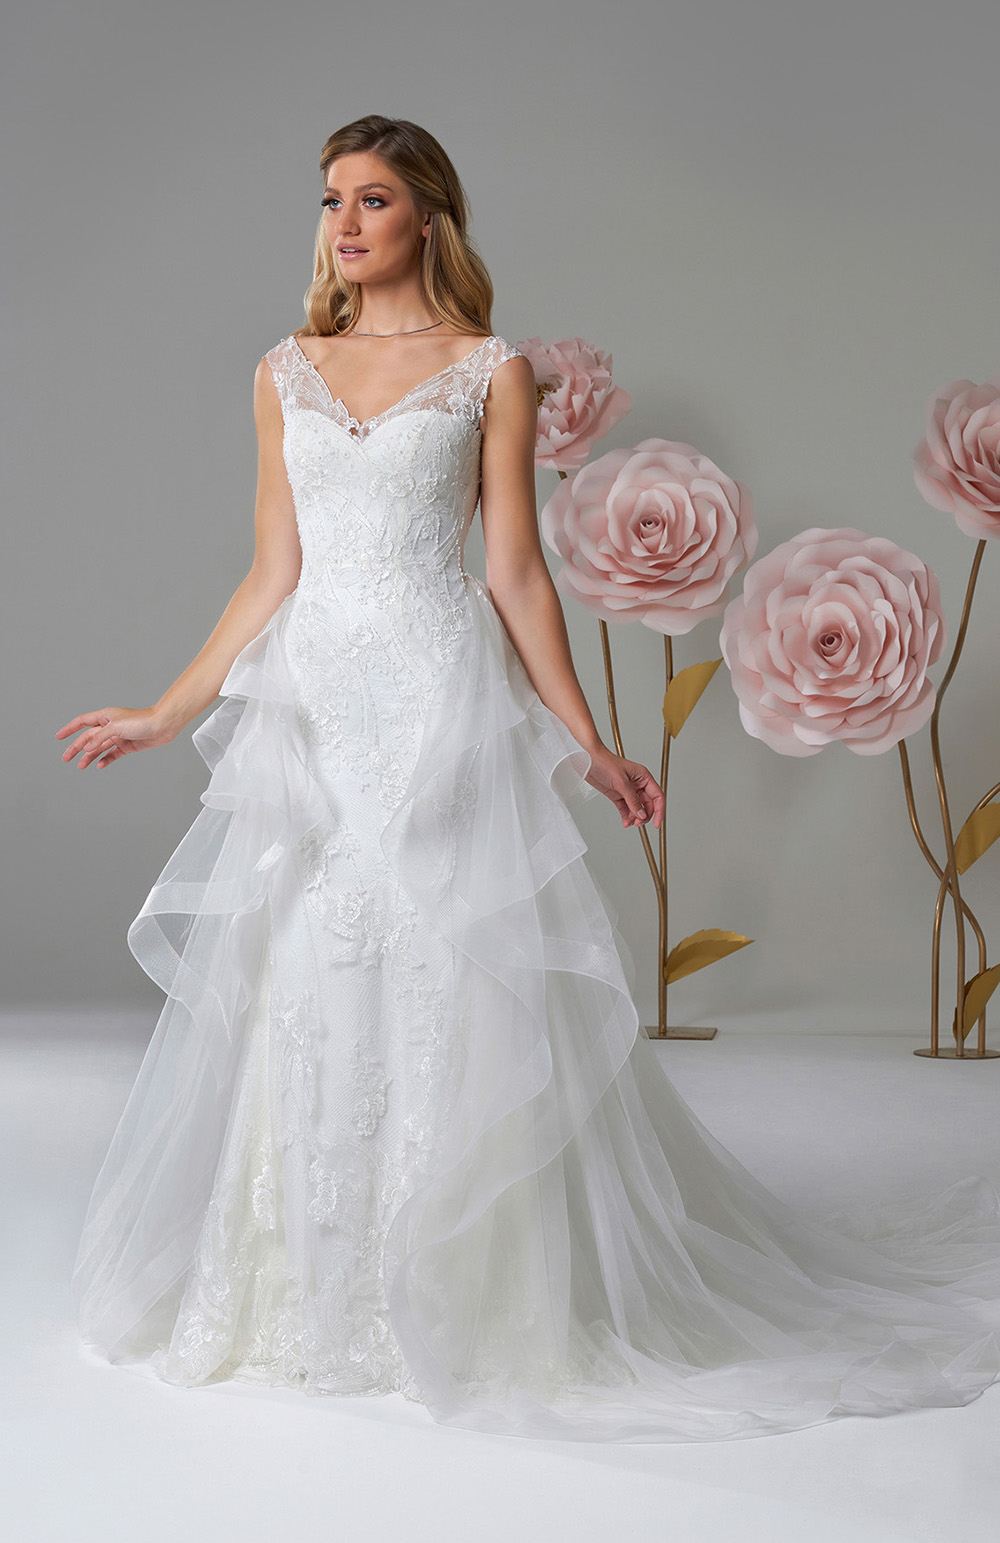 Robe de mariée Modèle Ilka